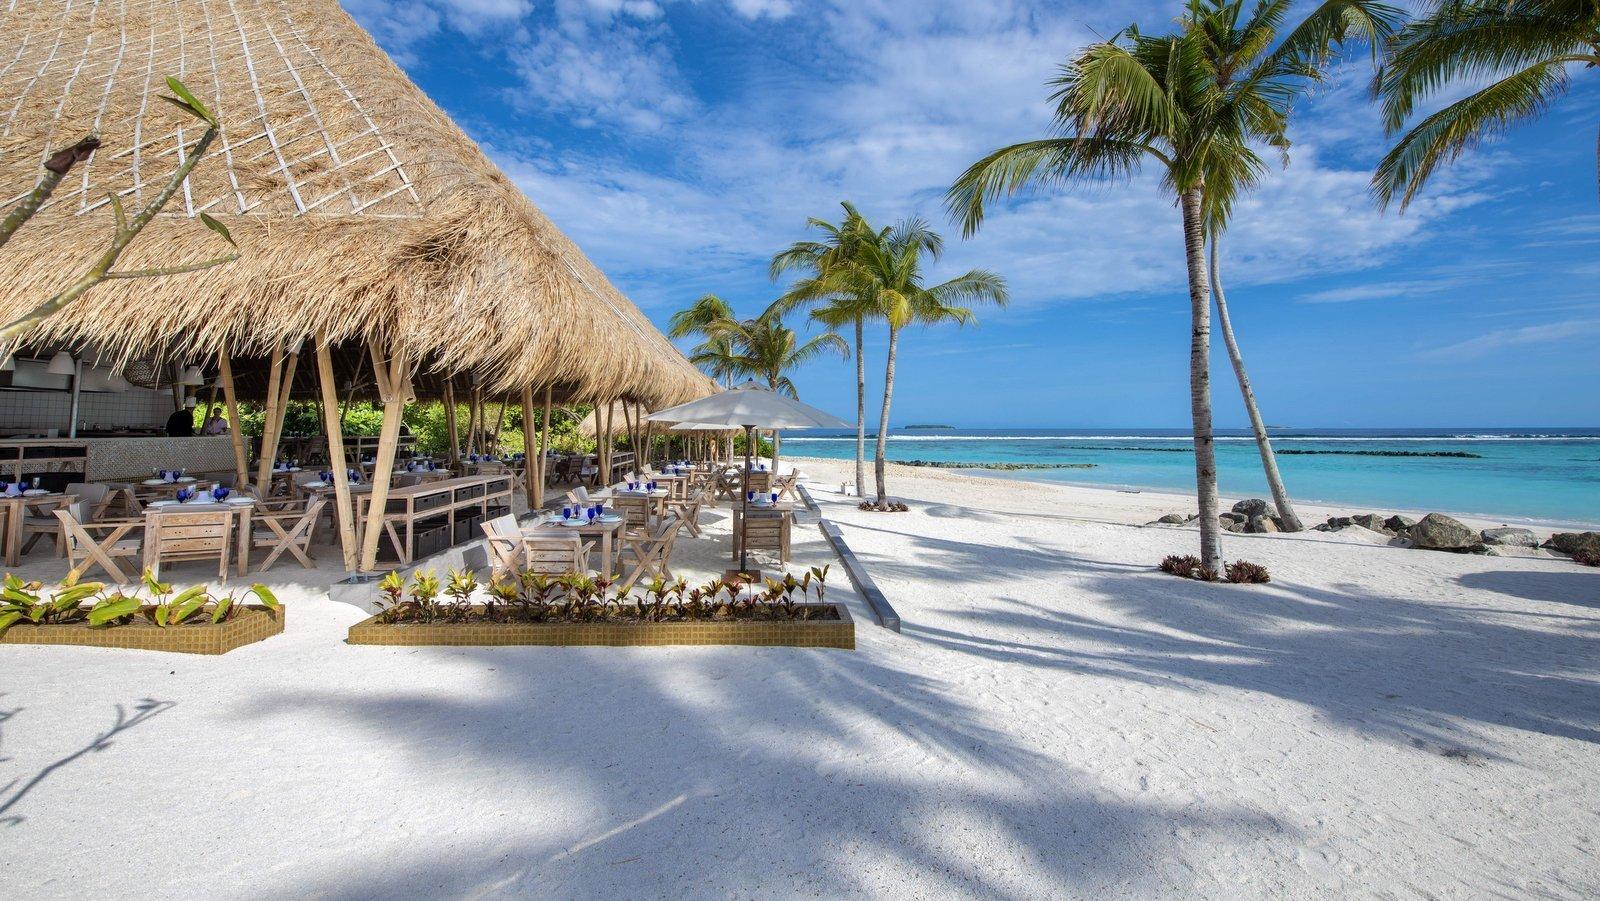 Мальдивы, отель Emerald Maldives Resort & Spa, ресторан Beach Club Grill